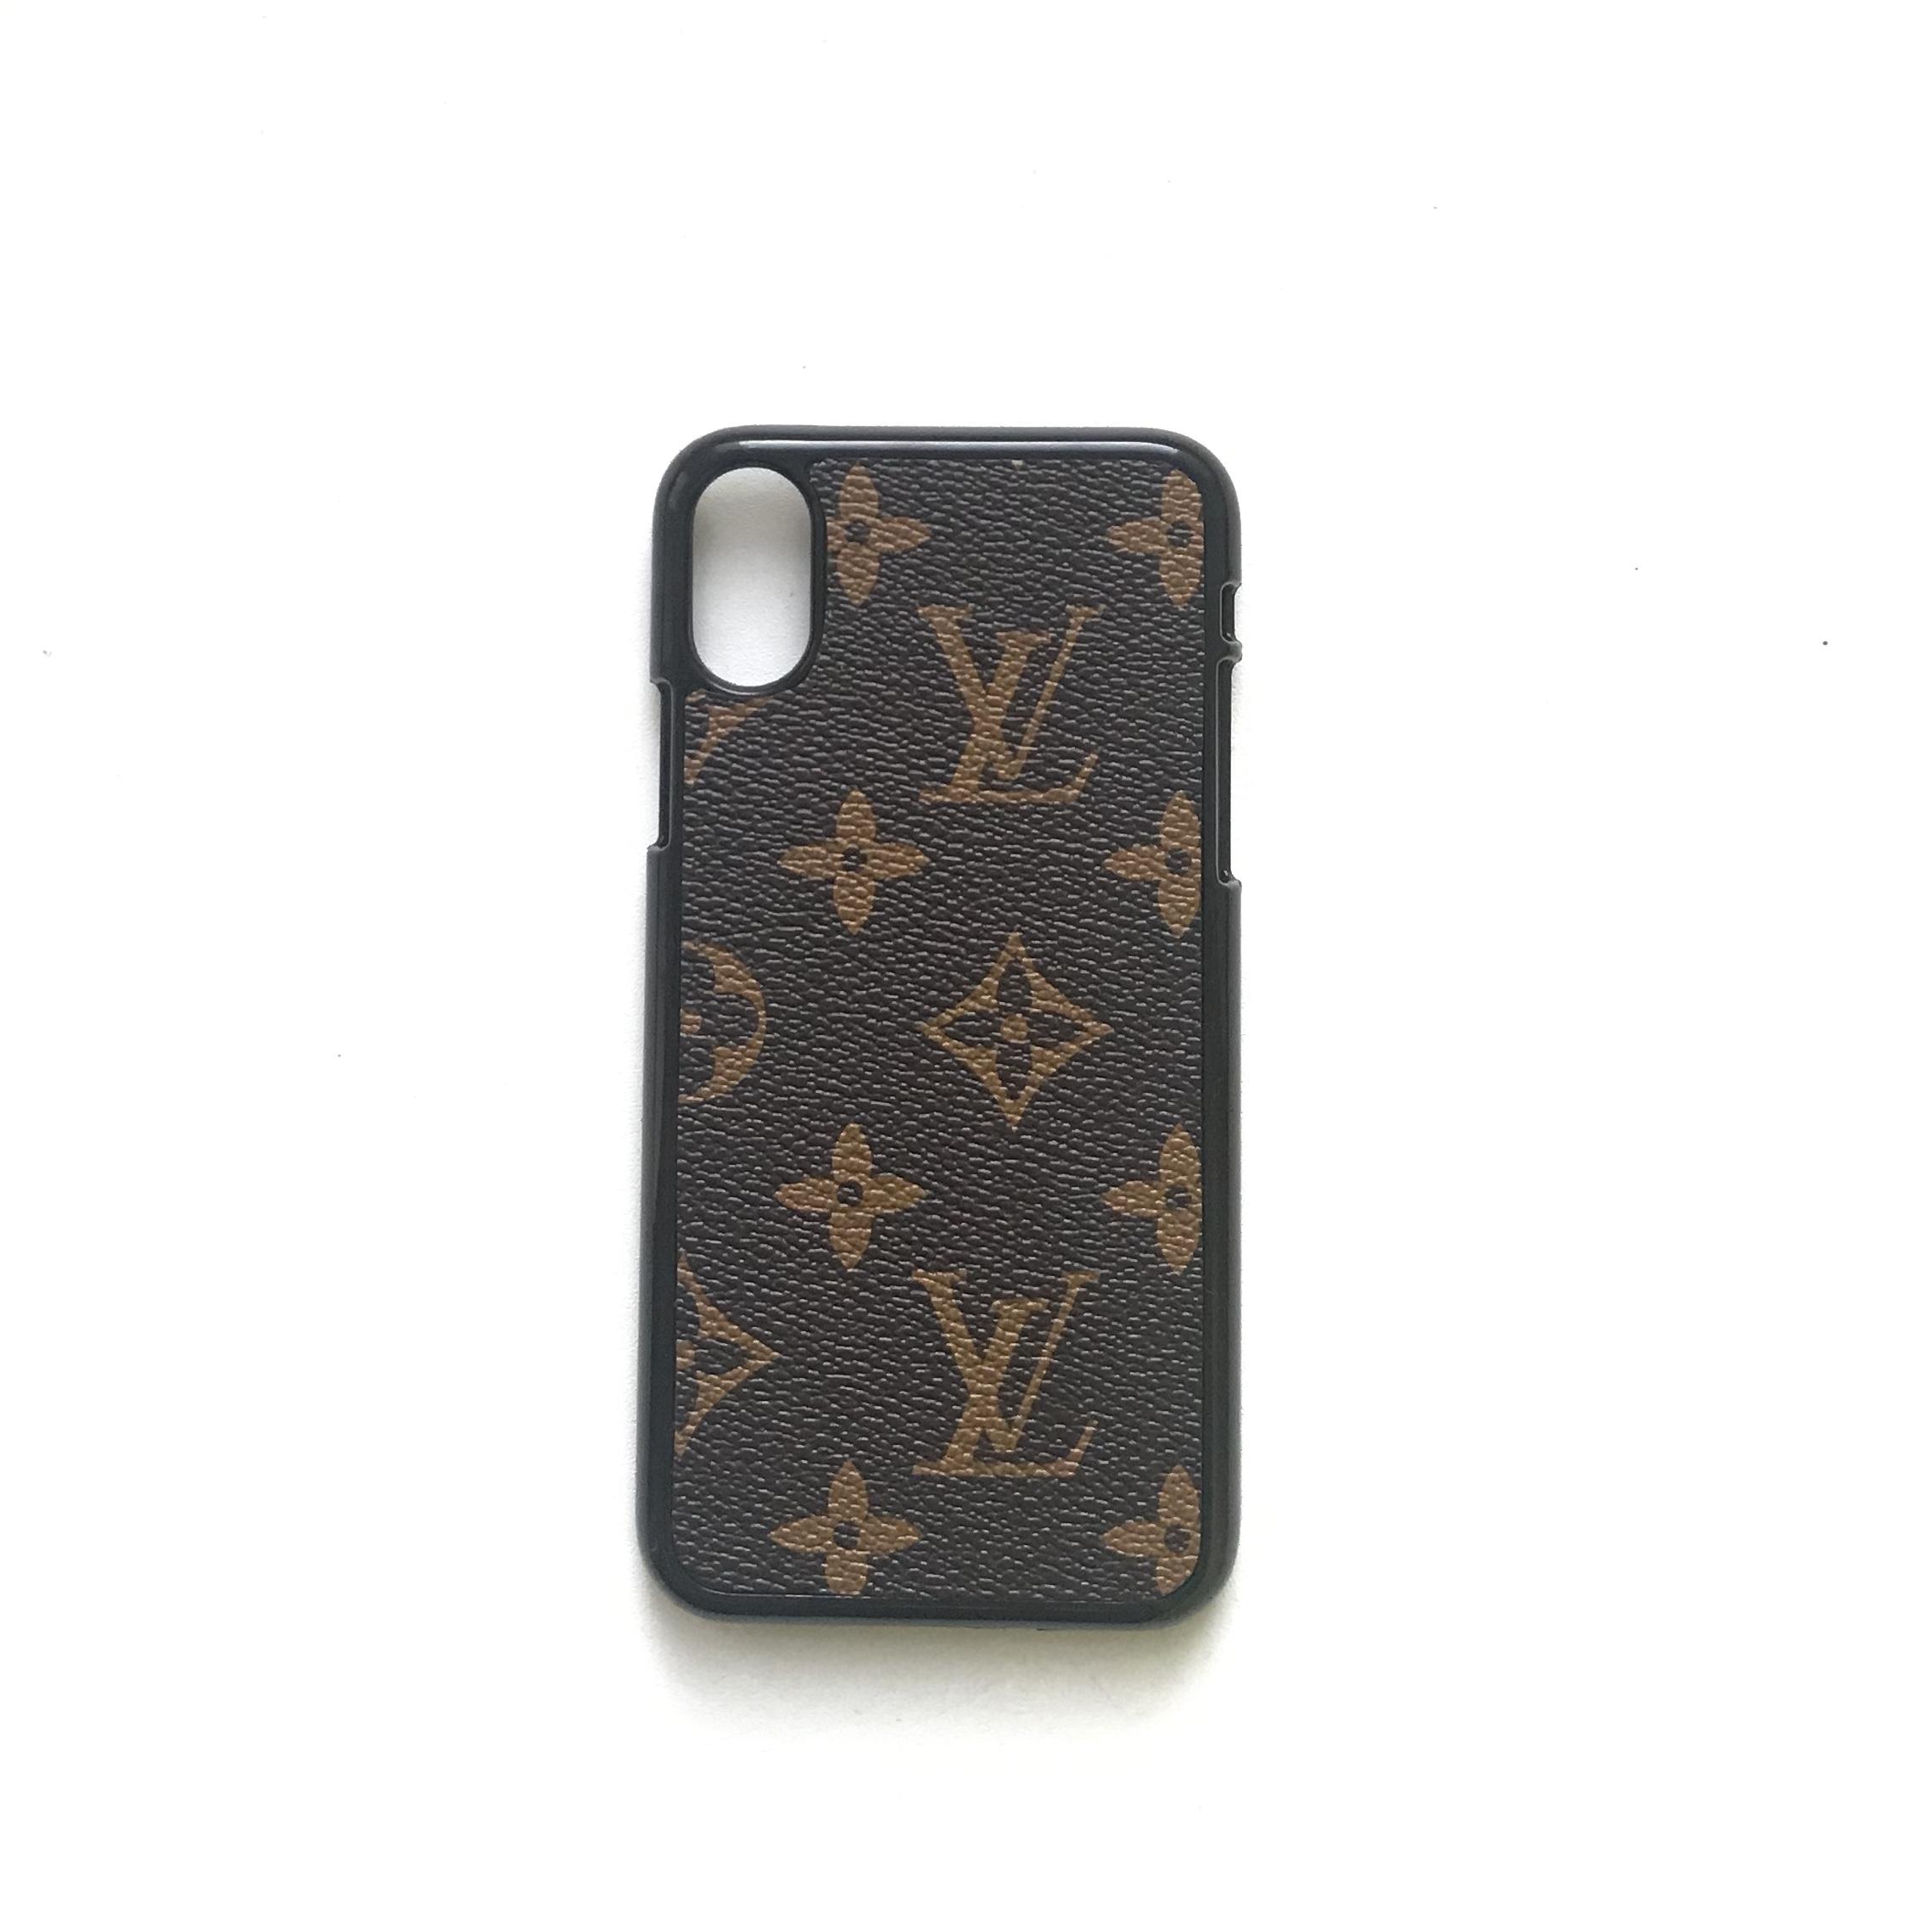 new concept f06ab d56fa Custom Louis Vuitton iPhone X/7/8/8 Plus/XR/XS/XS MAX Case